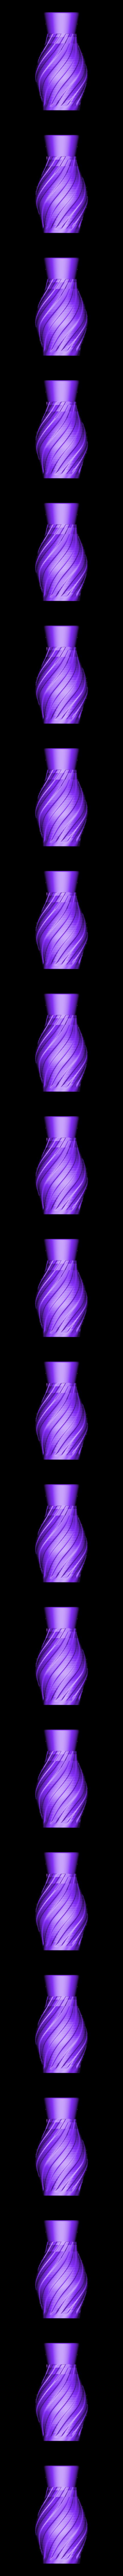 Small_VaseV1.obj Download OBJ file Small Vase V1 • 3D printable model, Keagan